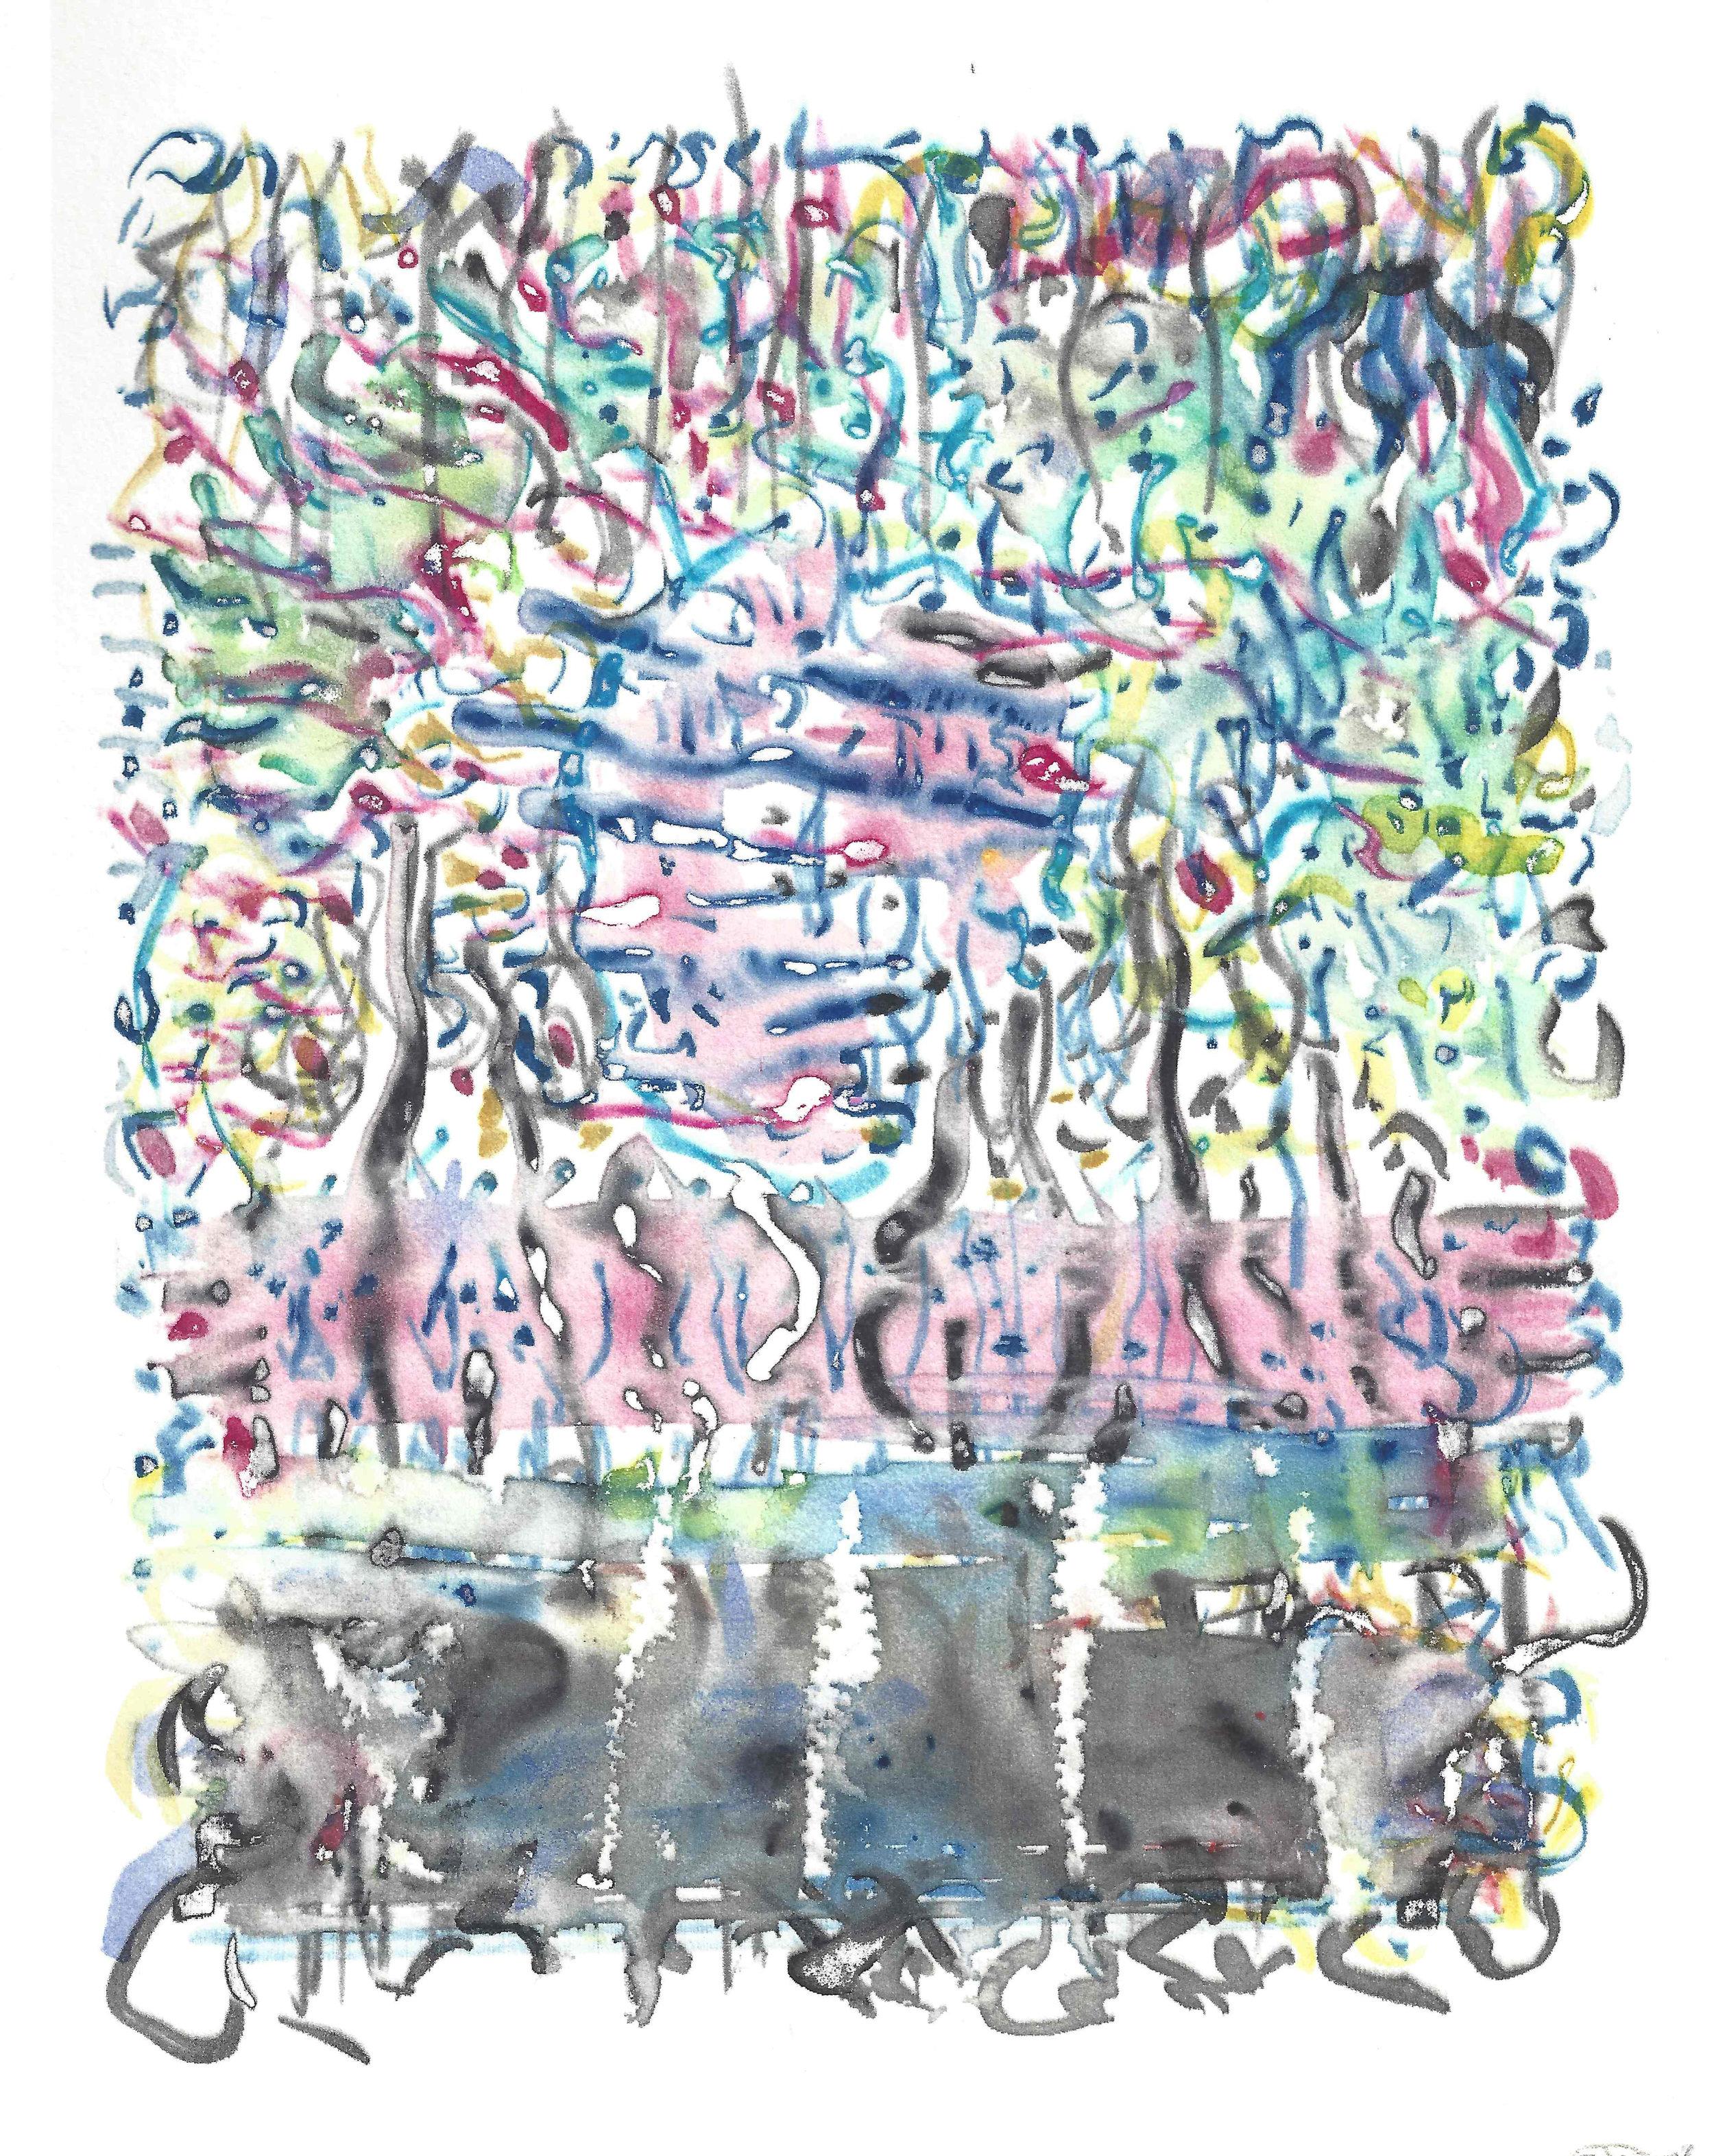 Carl Nanoff, Carnival, Watercolor screenprint, 2019